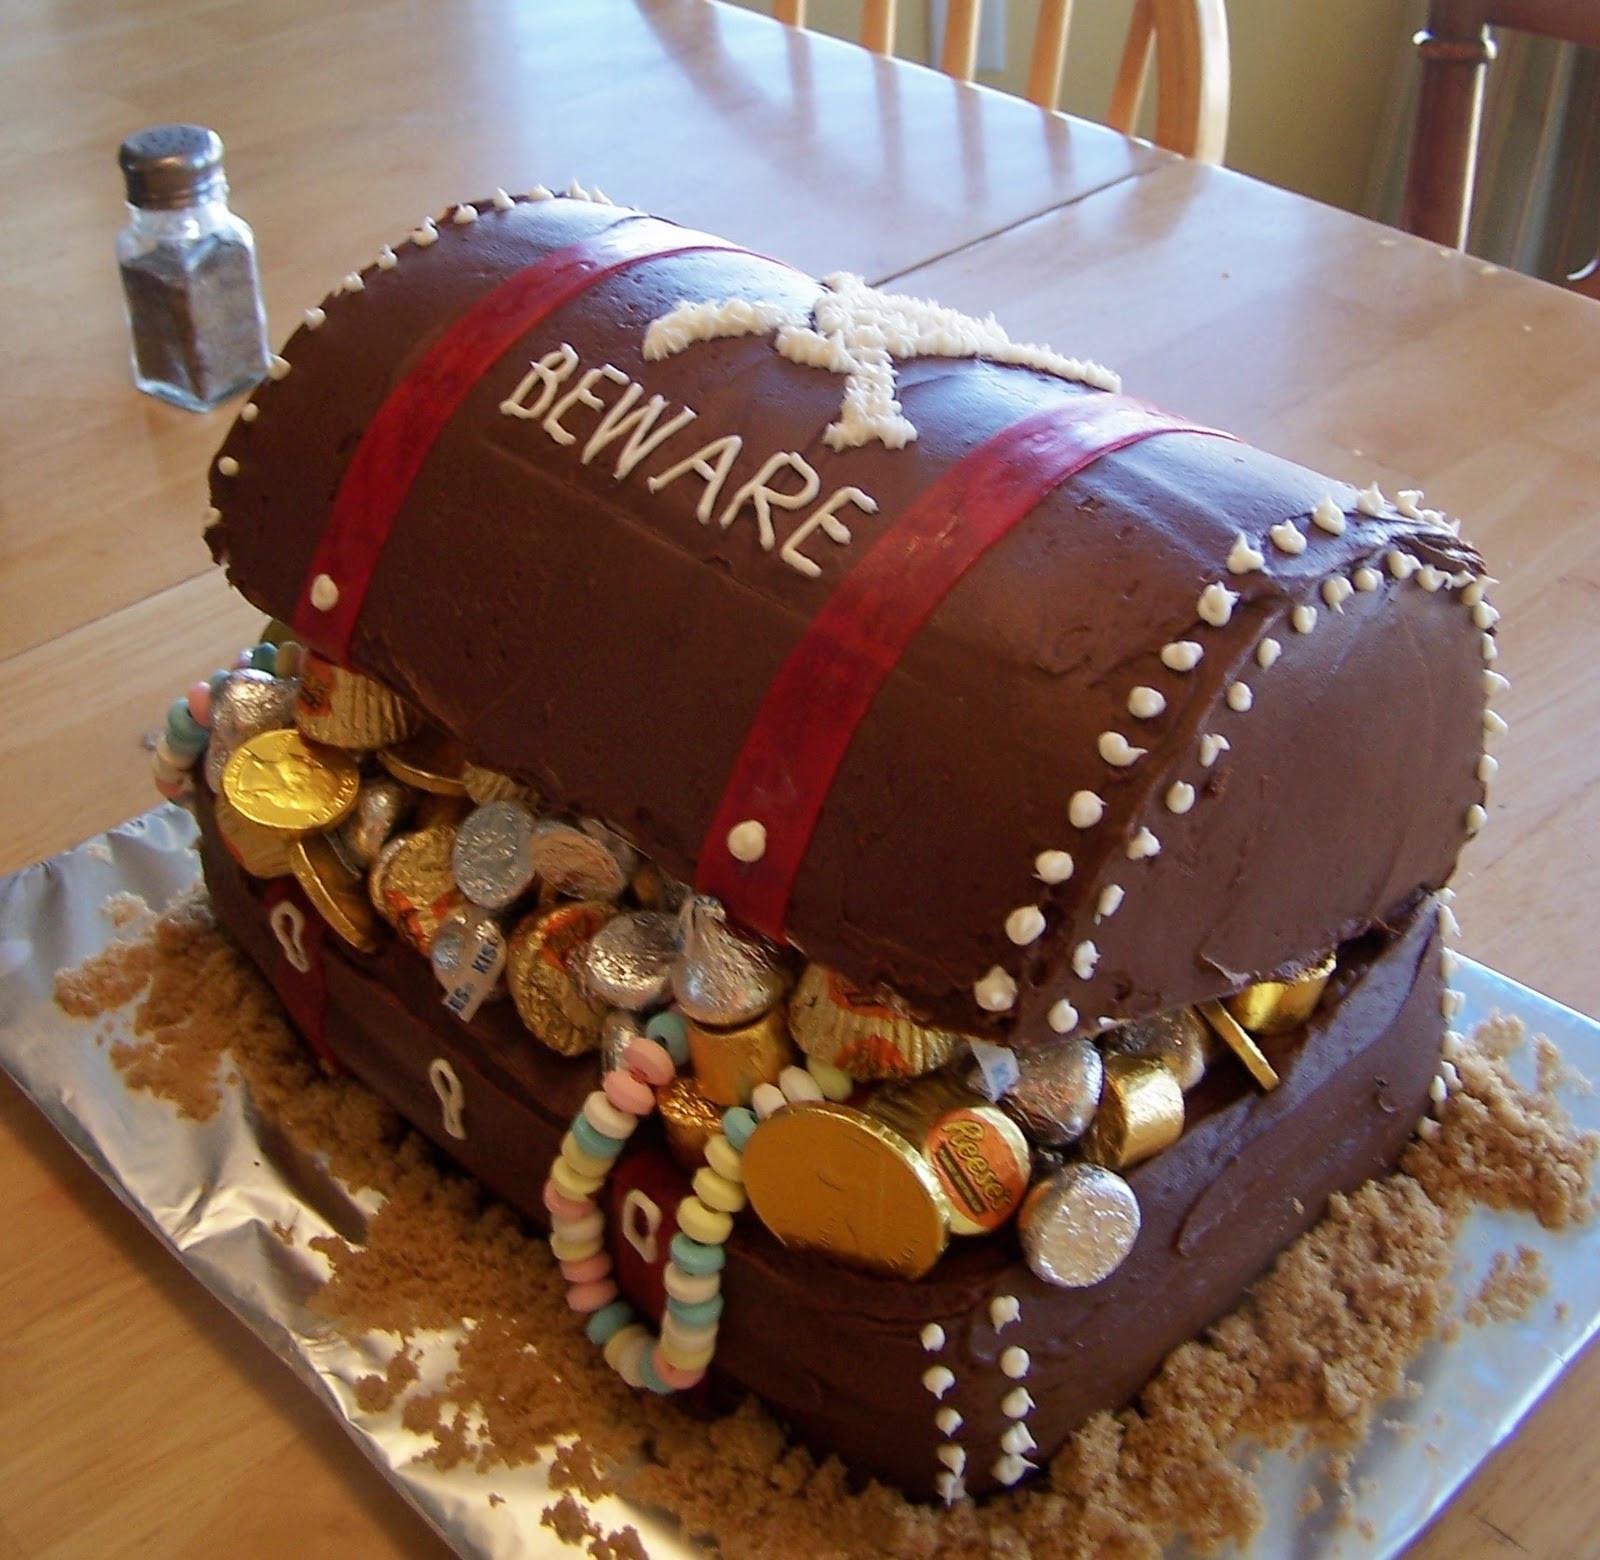 Pirate Birthday Cake  Batchelors Way Pirate Party